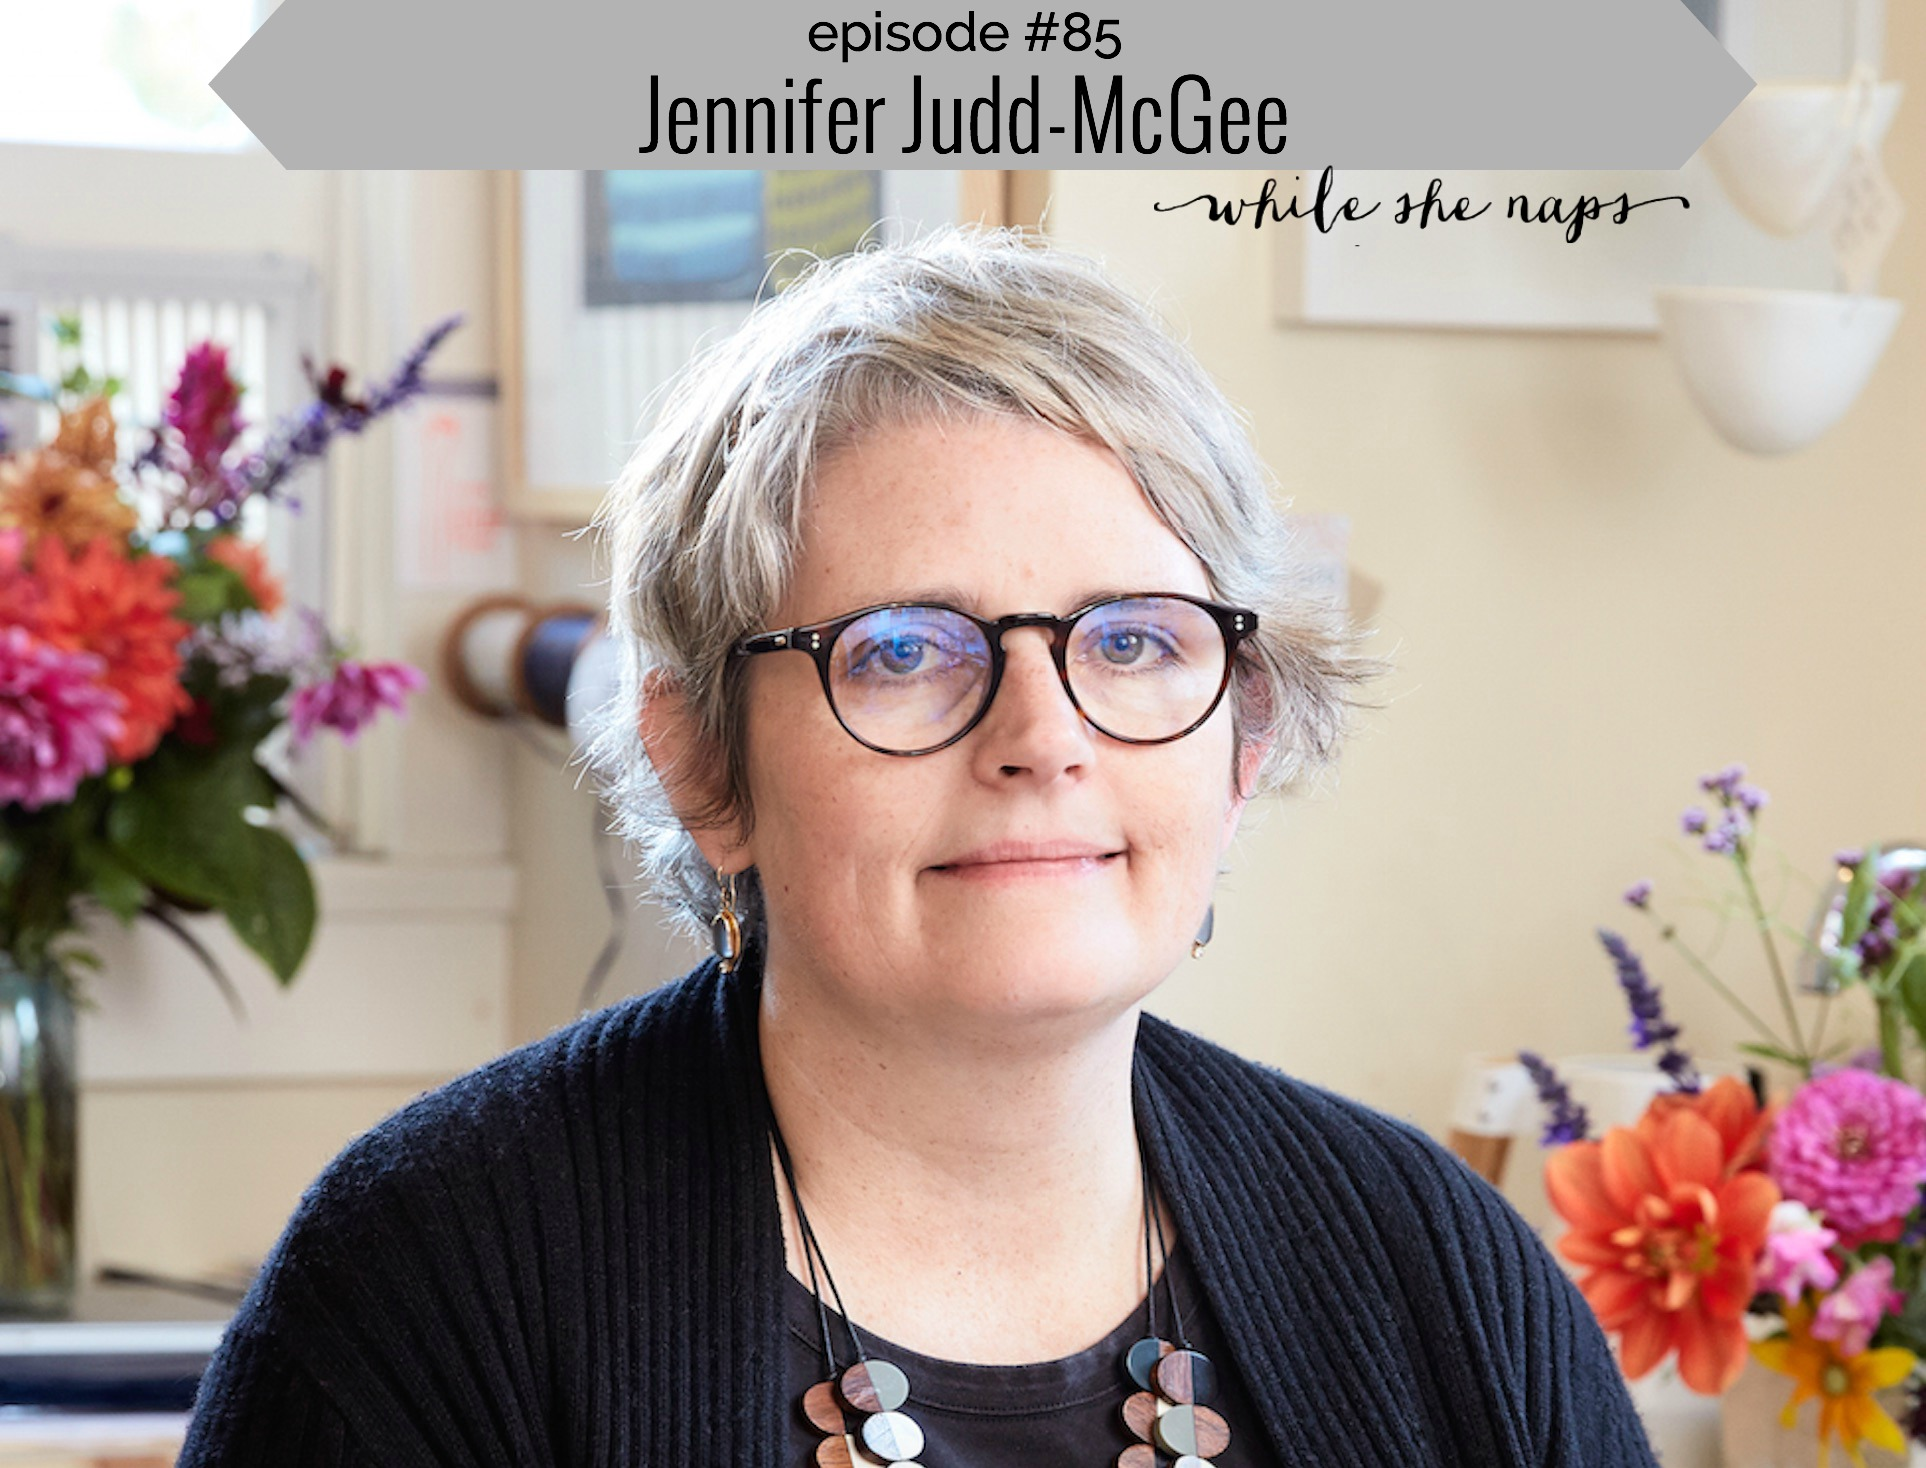 jennifer-judd-mcgee-episode-85